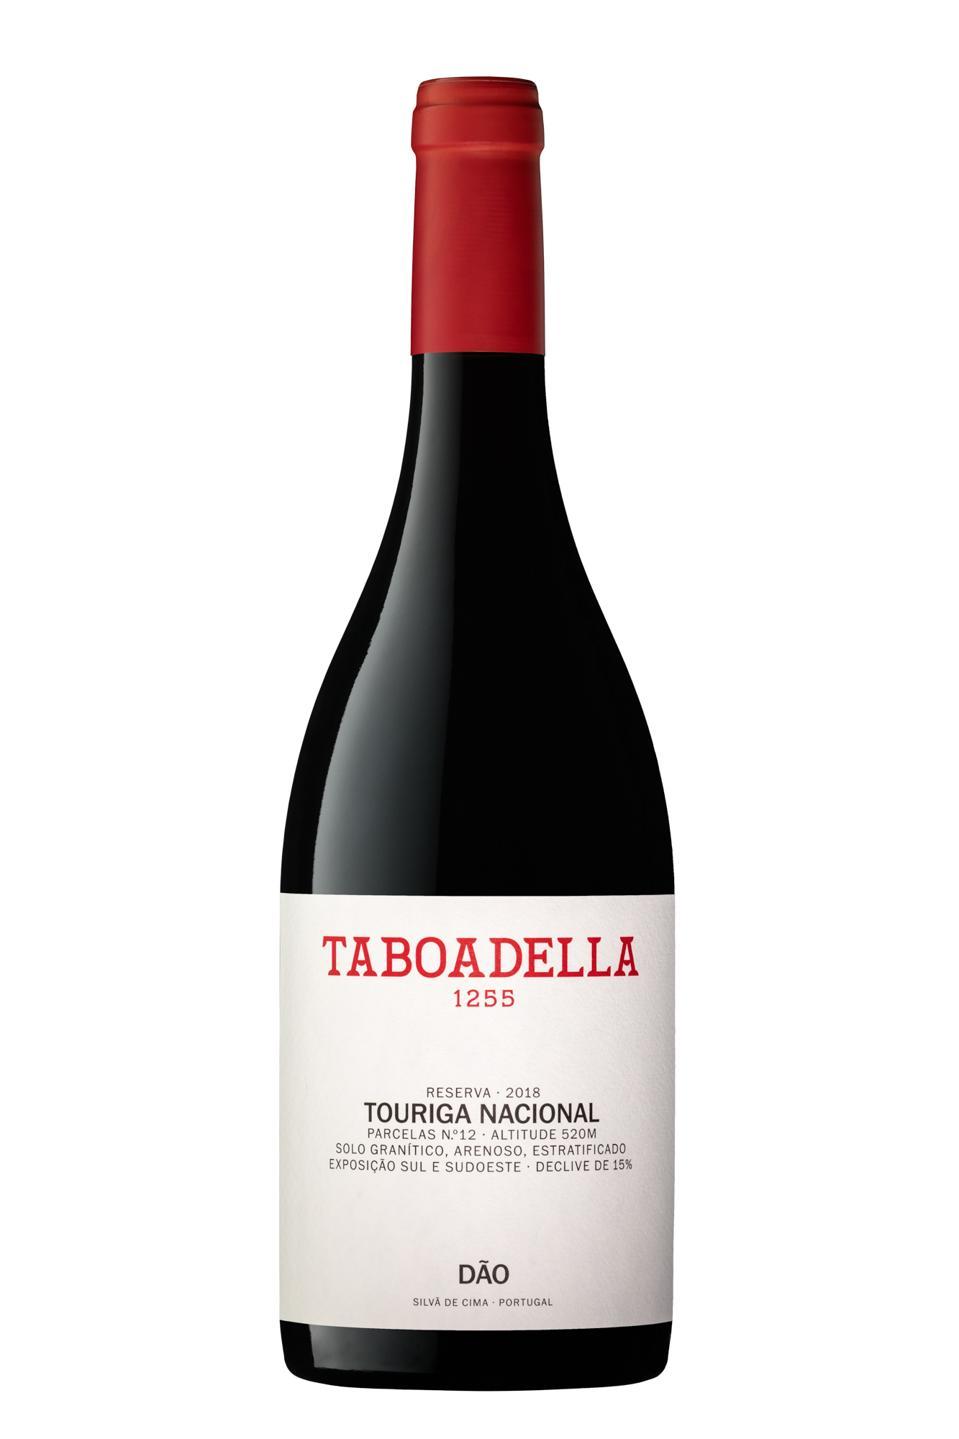 Taboadella Touriga Nacional wine